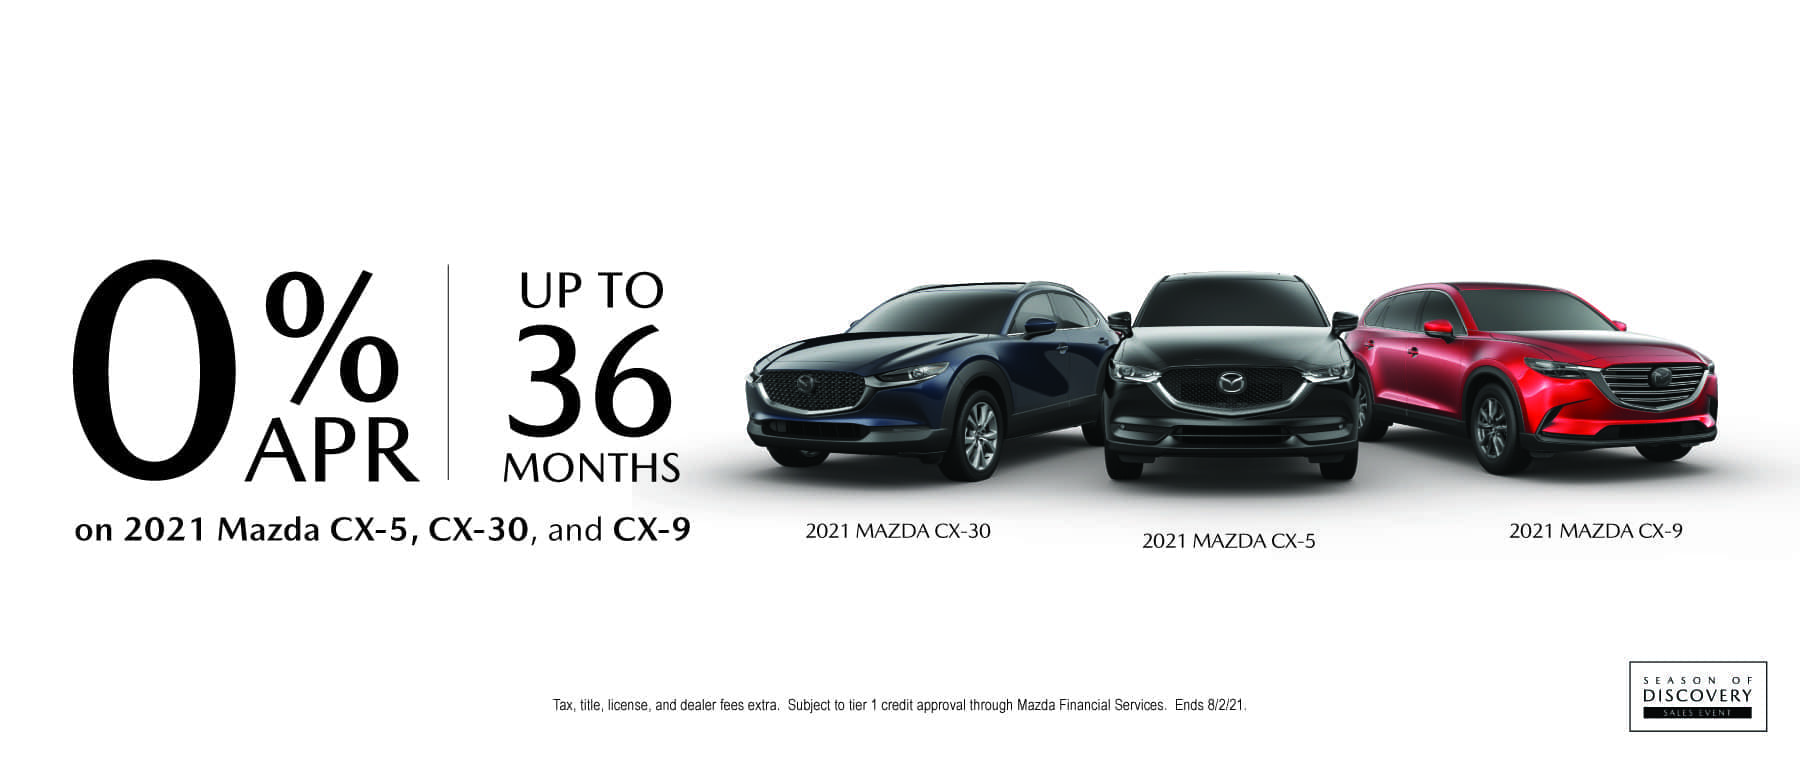 July-2021-Mazda-CS-Slides_0APR36